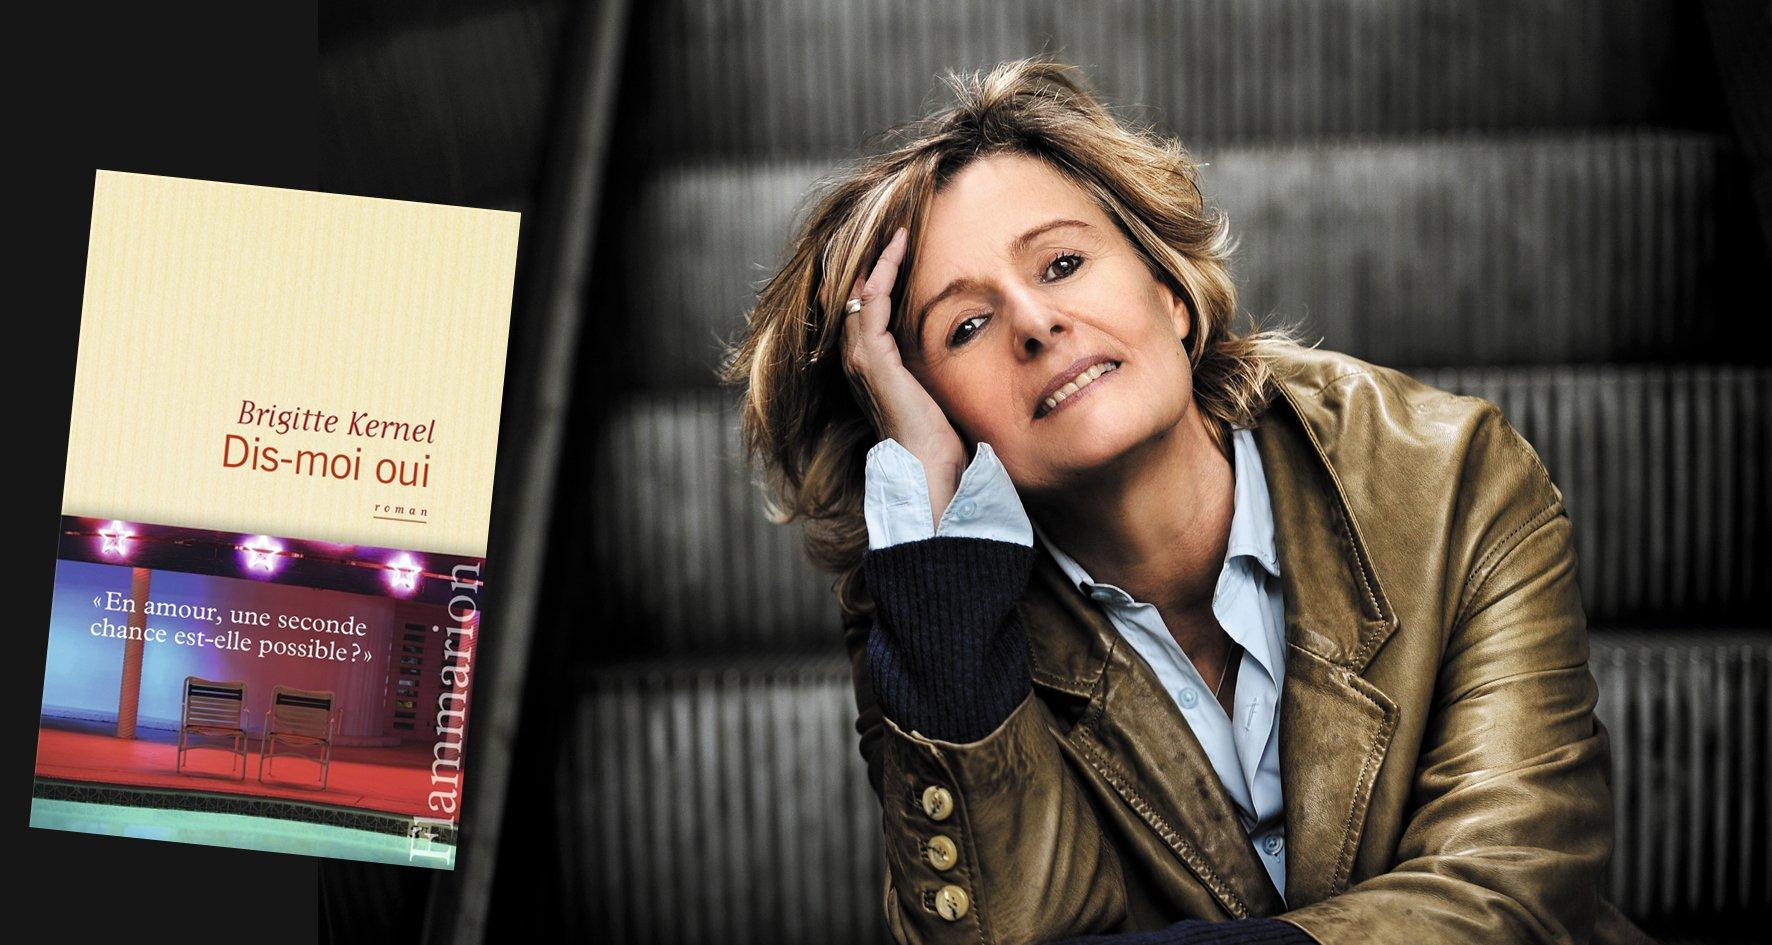 «Dis-moi oui», le nouveau roman de Brigitte Kernel sort aujourd'hui